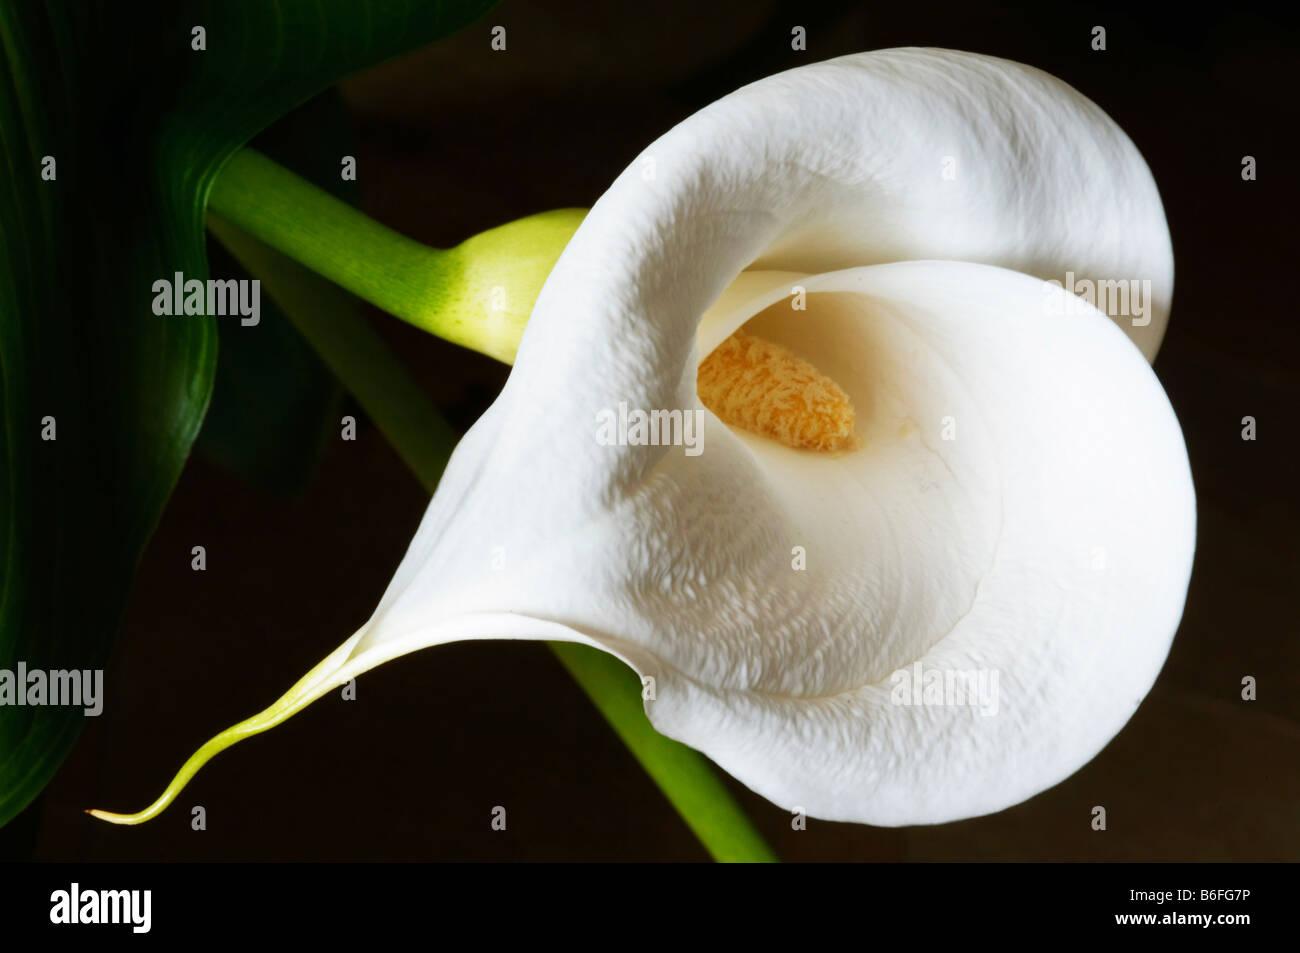 blume calla oder arum lilie zantedeschia stockfoto bild 21240346 alamy. Black Bedroom Furniture Sets. Home Design Ideas